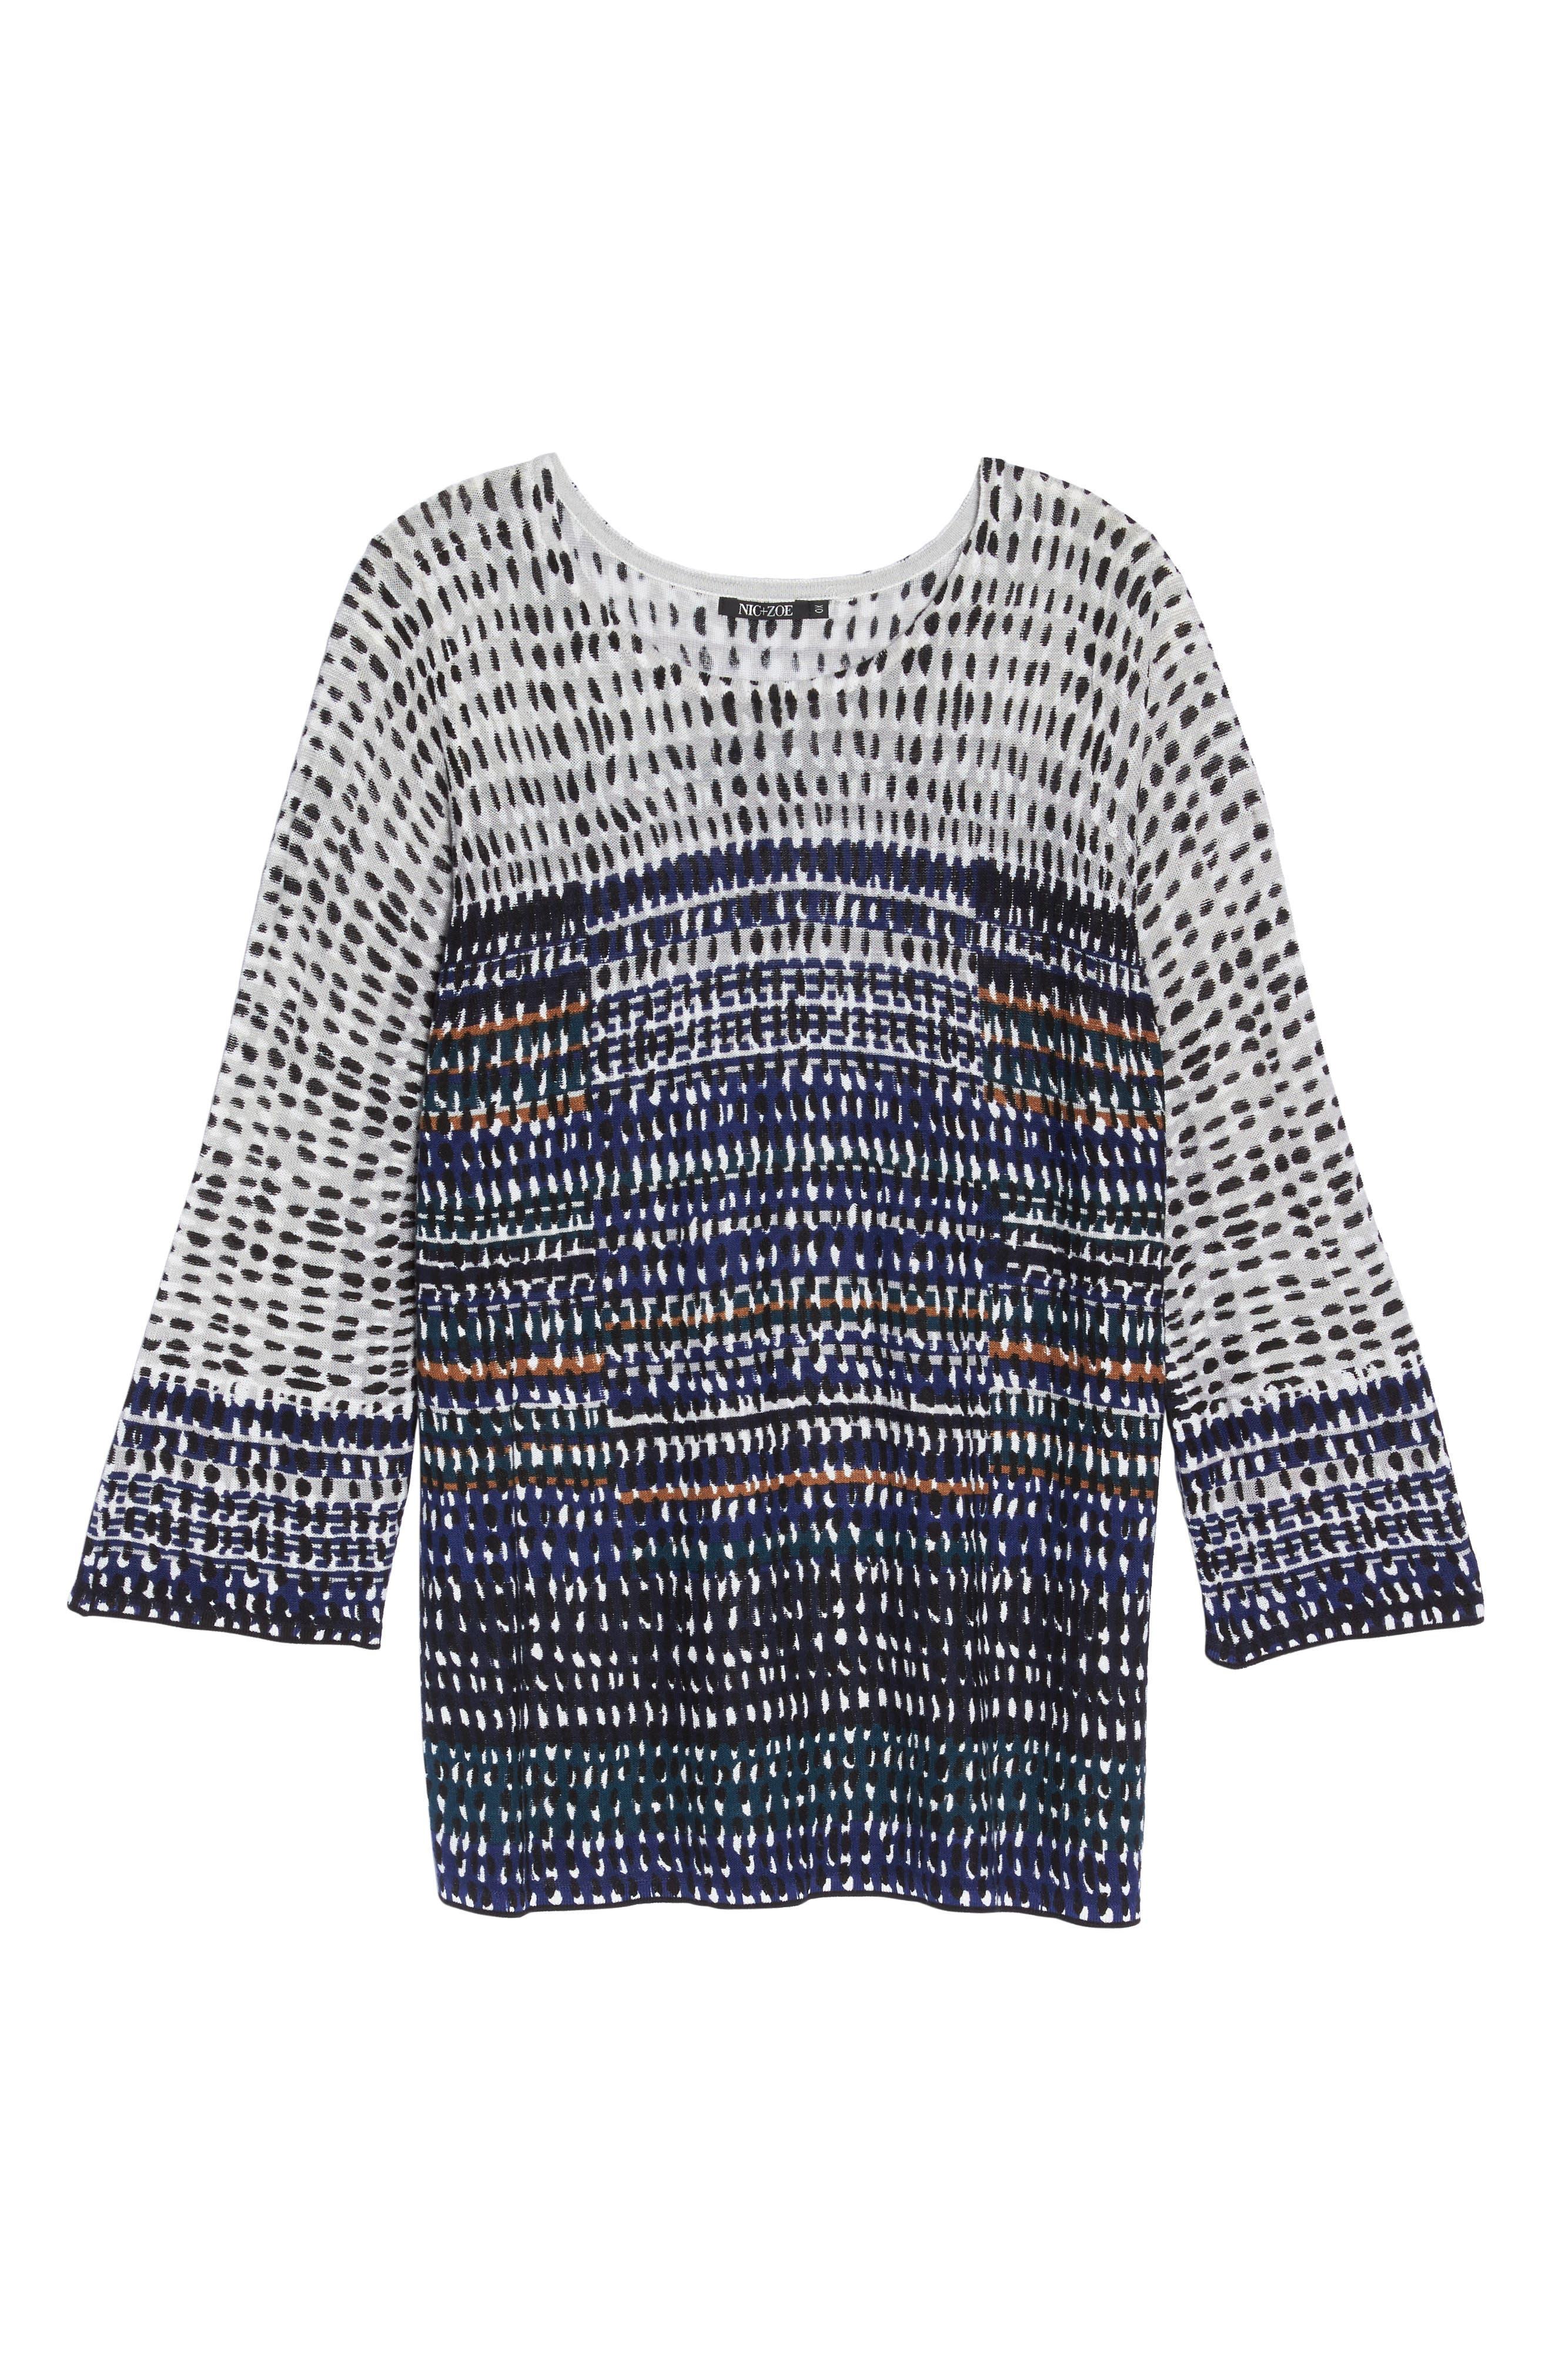 New Light Knit Tunic Top,                             Alternate thumbnail 6, color,